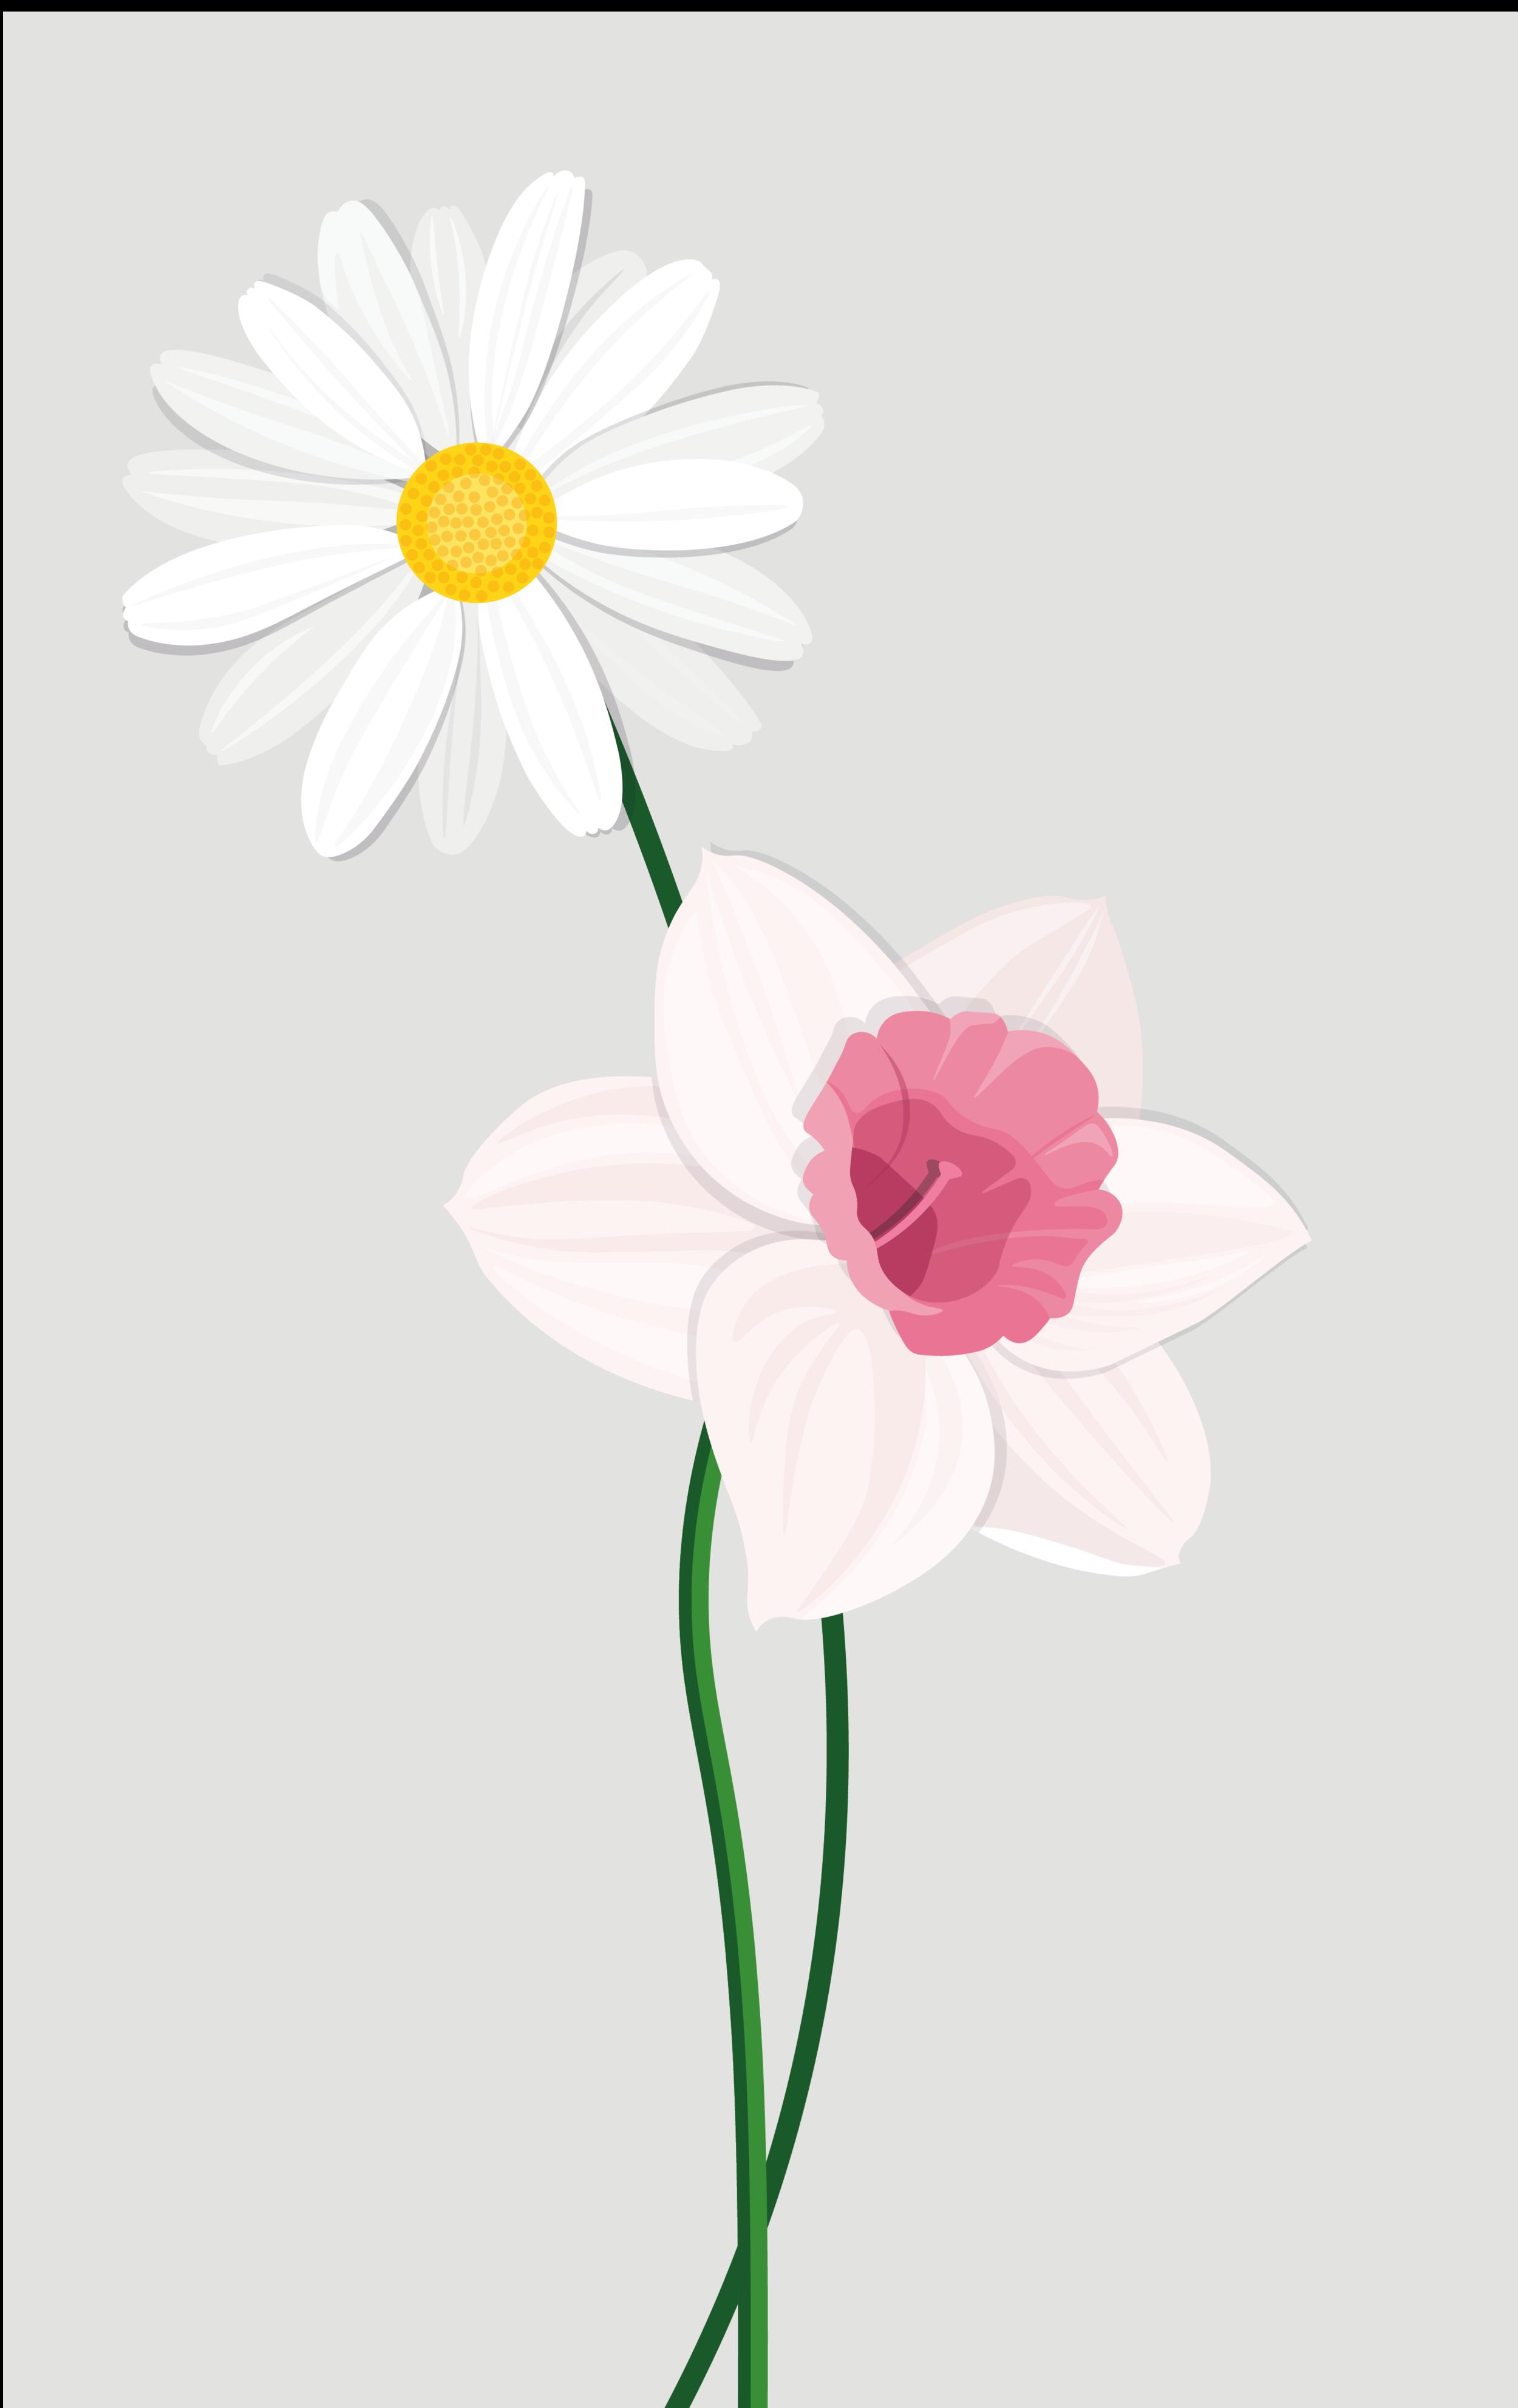 Flower_CARD_Tavola disegno 1 copia 2.png